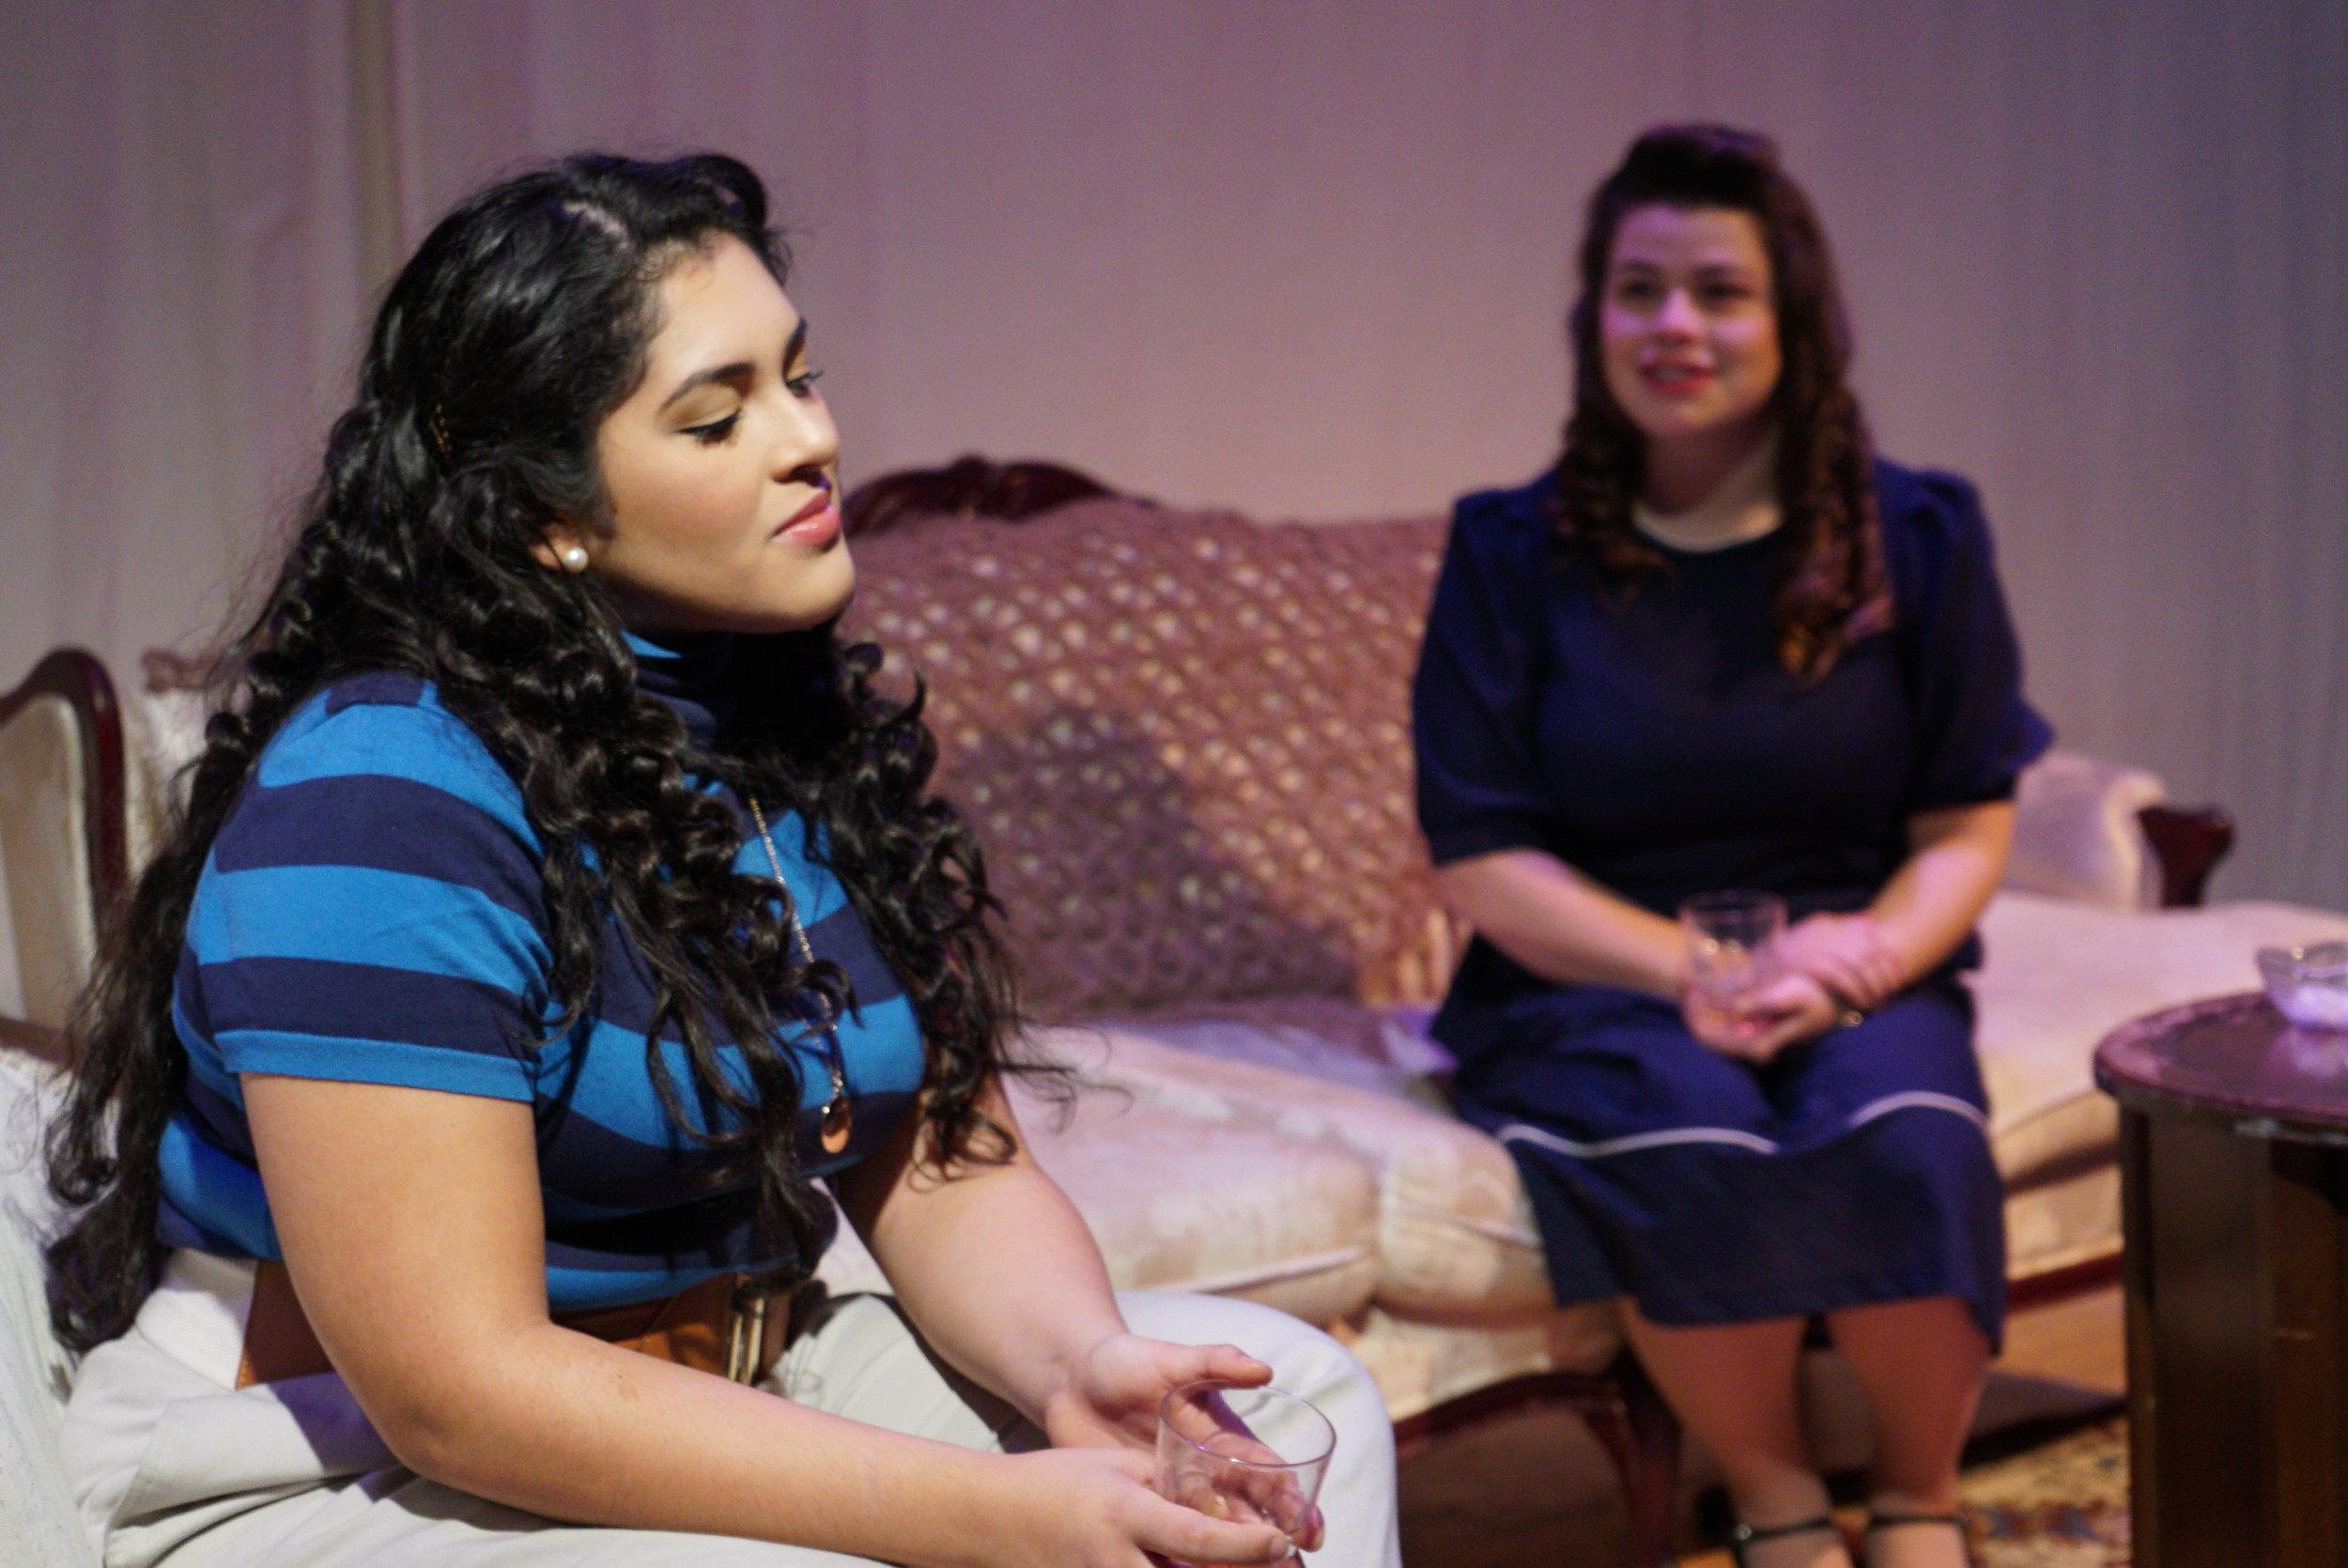 Sophia Aranda (Cindy) and Shanna Iglesias (Christina), Act II